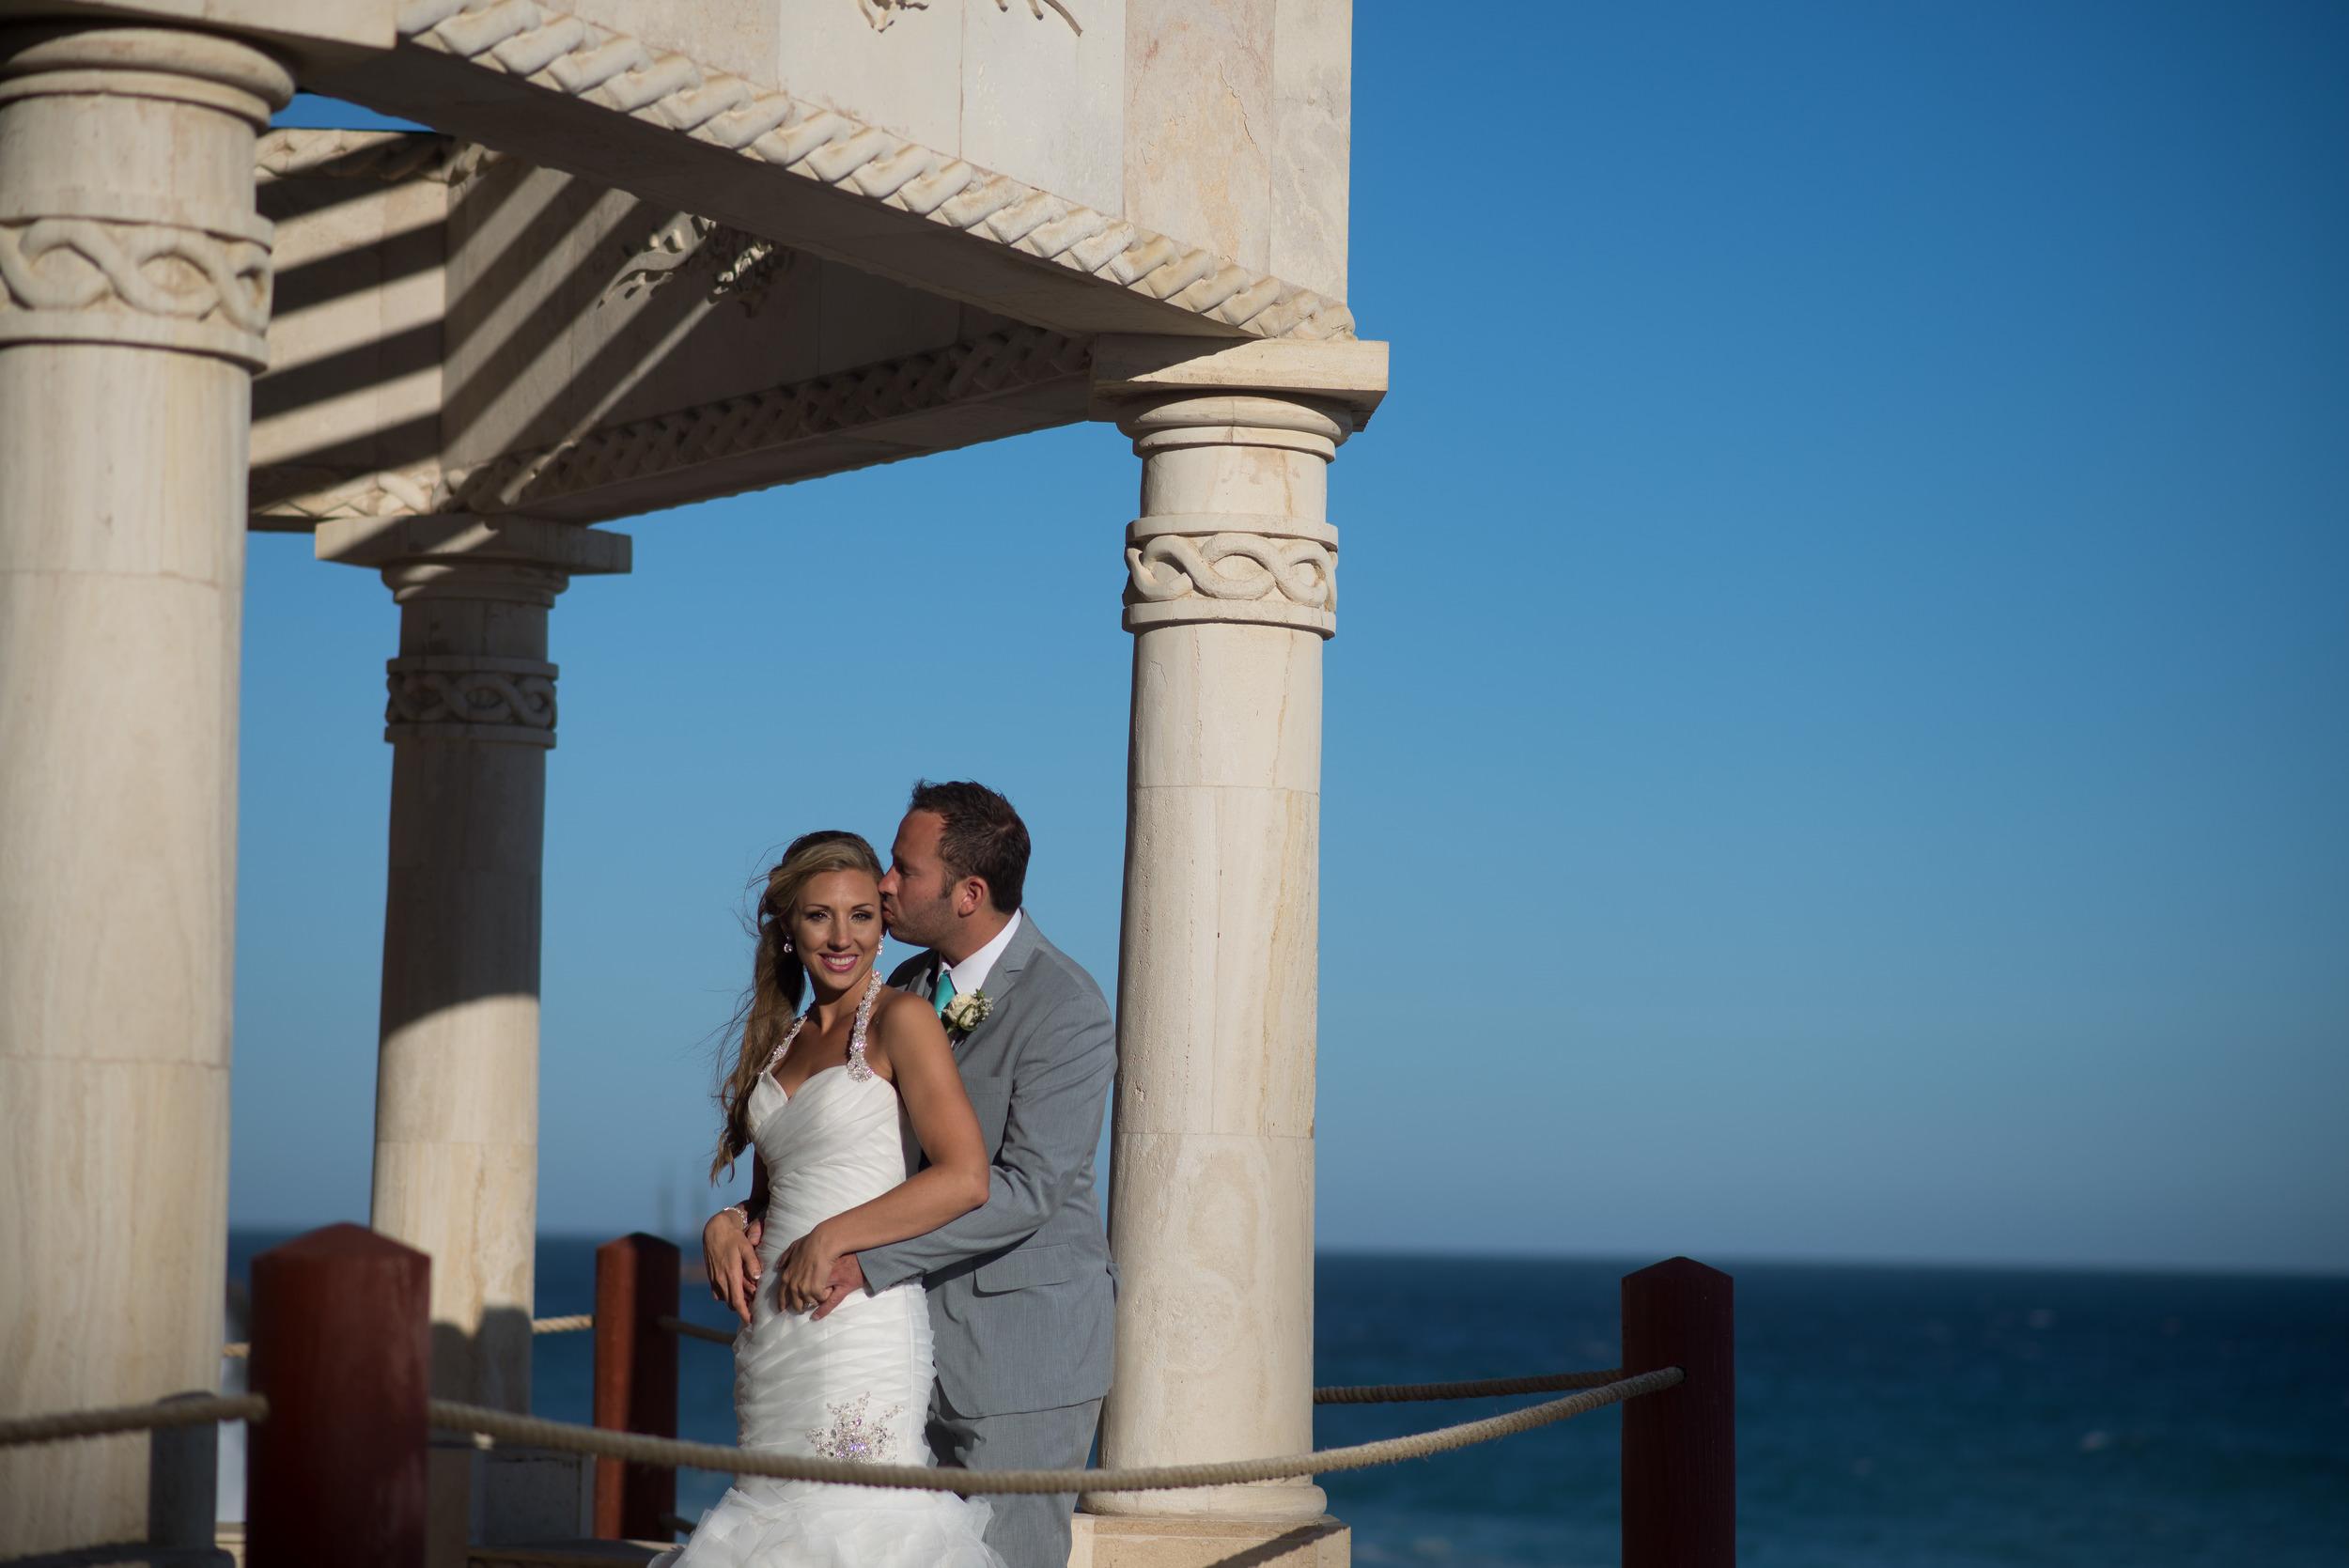 Our wedding day-866.JPG